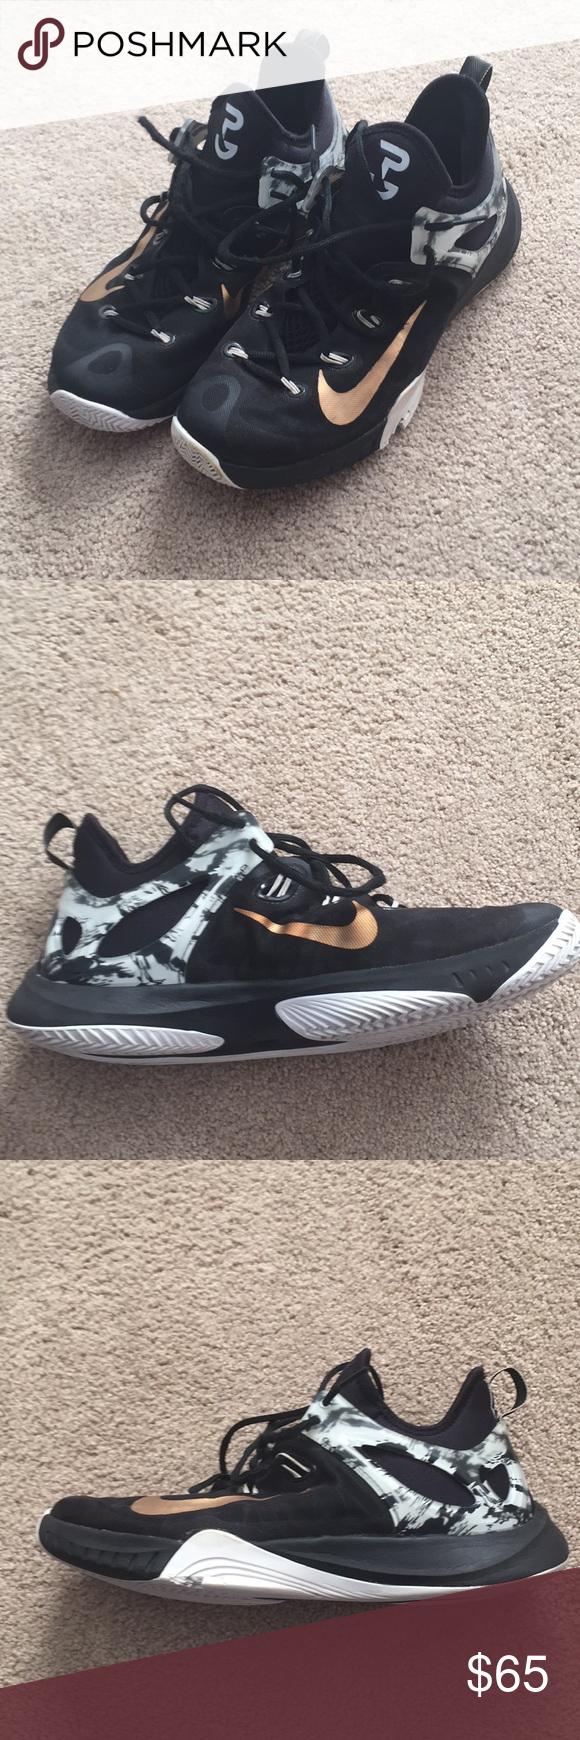 buy online c66b6 60cbb Nike hyperrev 2015 PG Edition Nike Hyperrev 2015 Paul George ...